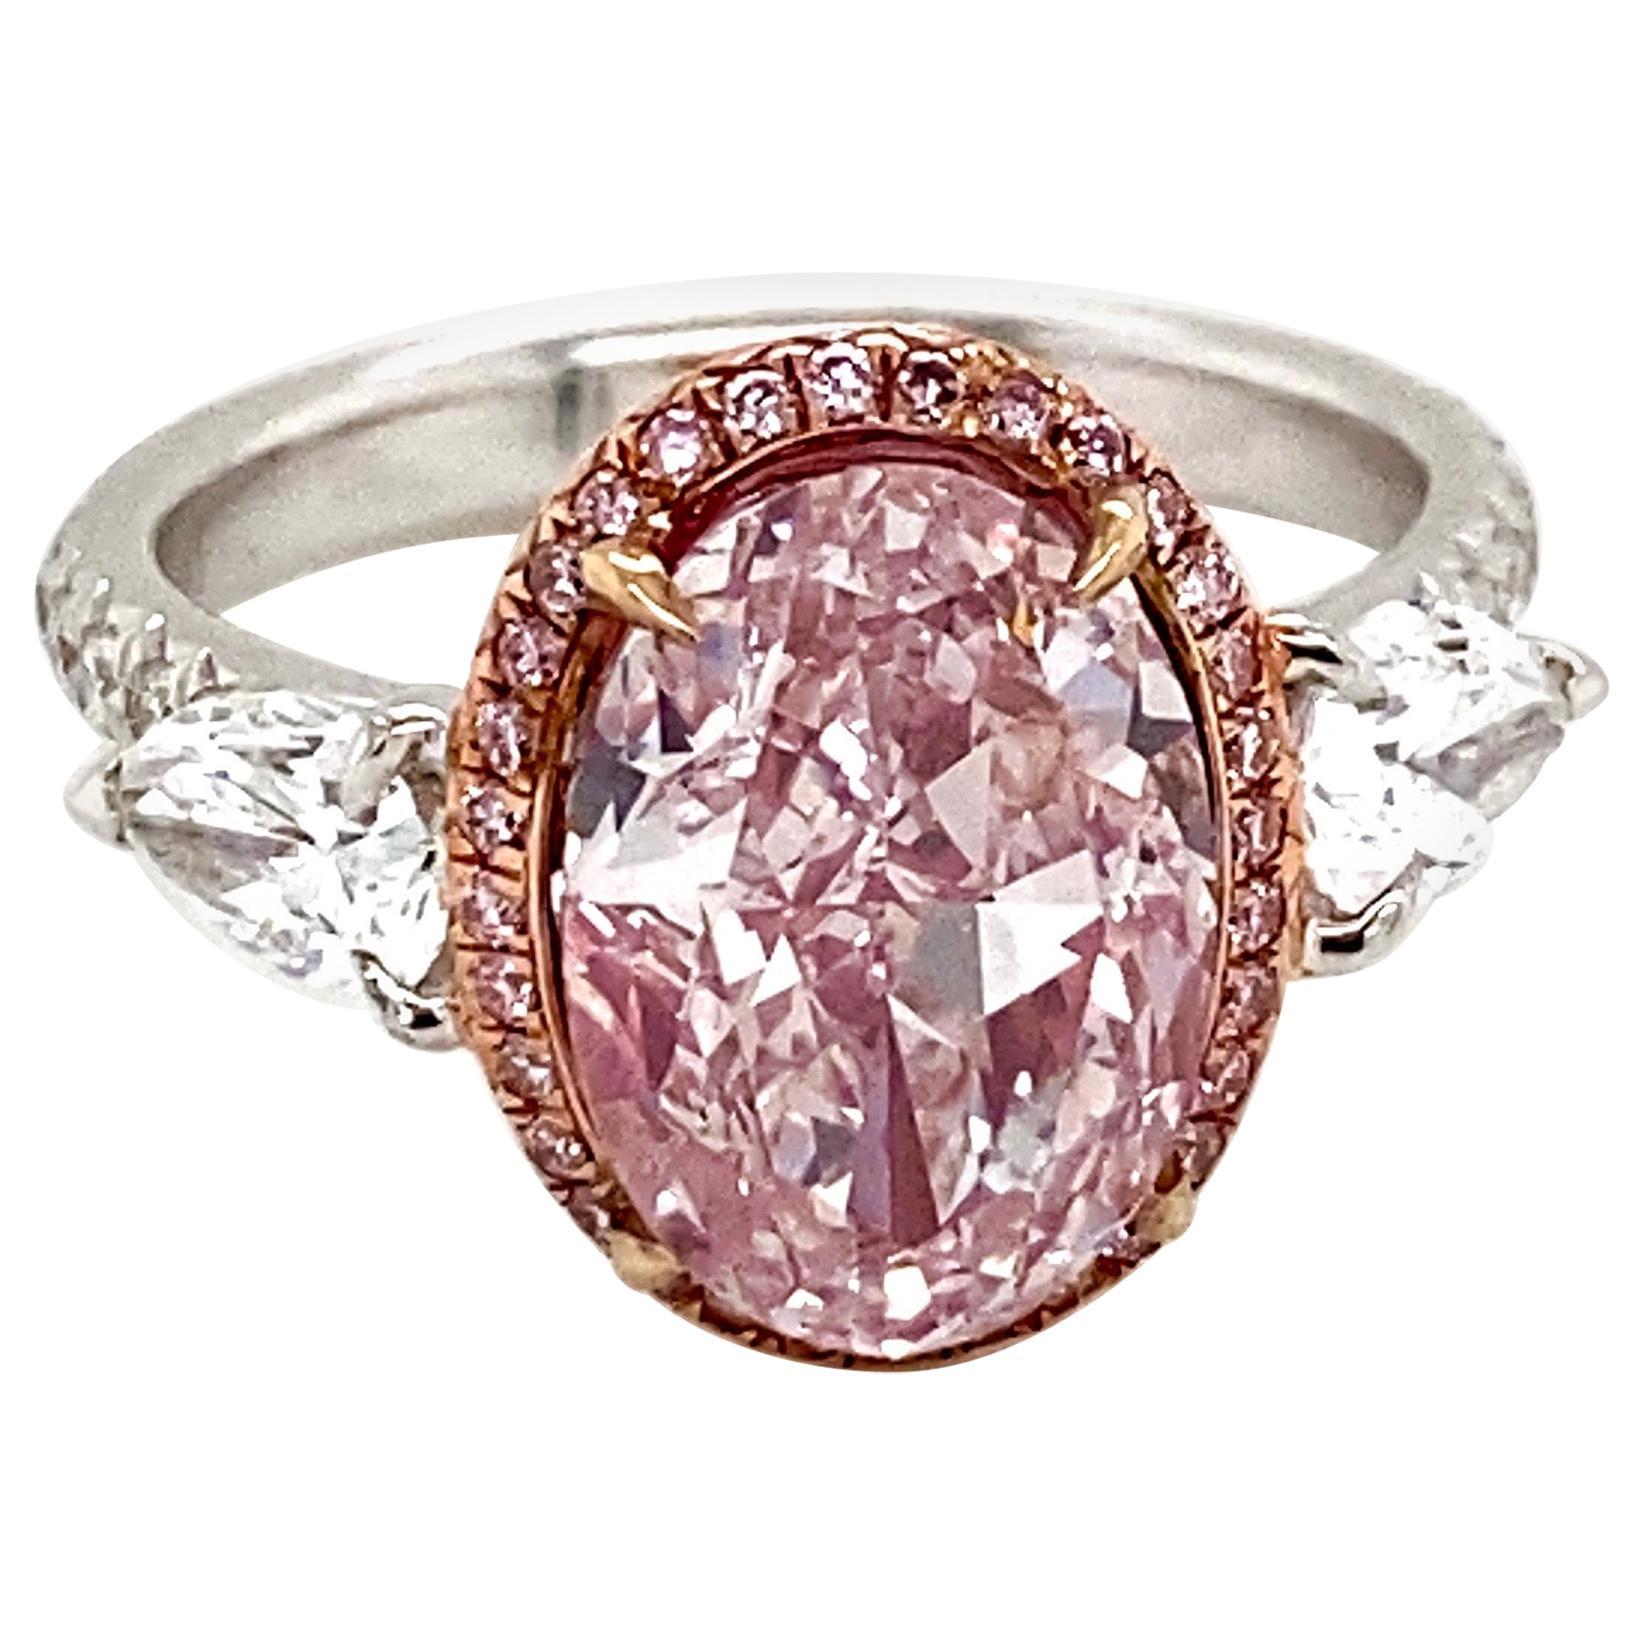 Emilio Jewelry GIA Certified 3.00 Carat Fancy Light Pure Pink Diamond Ring